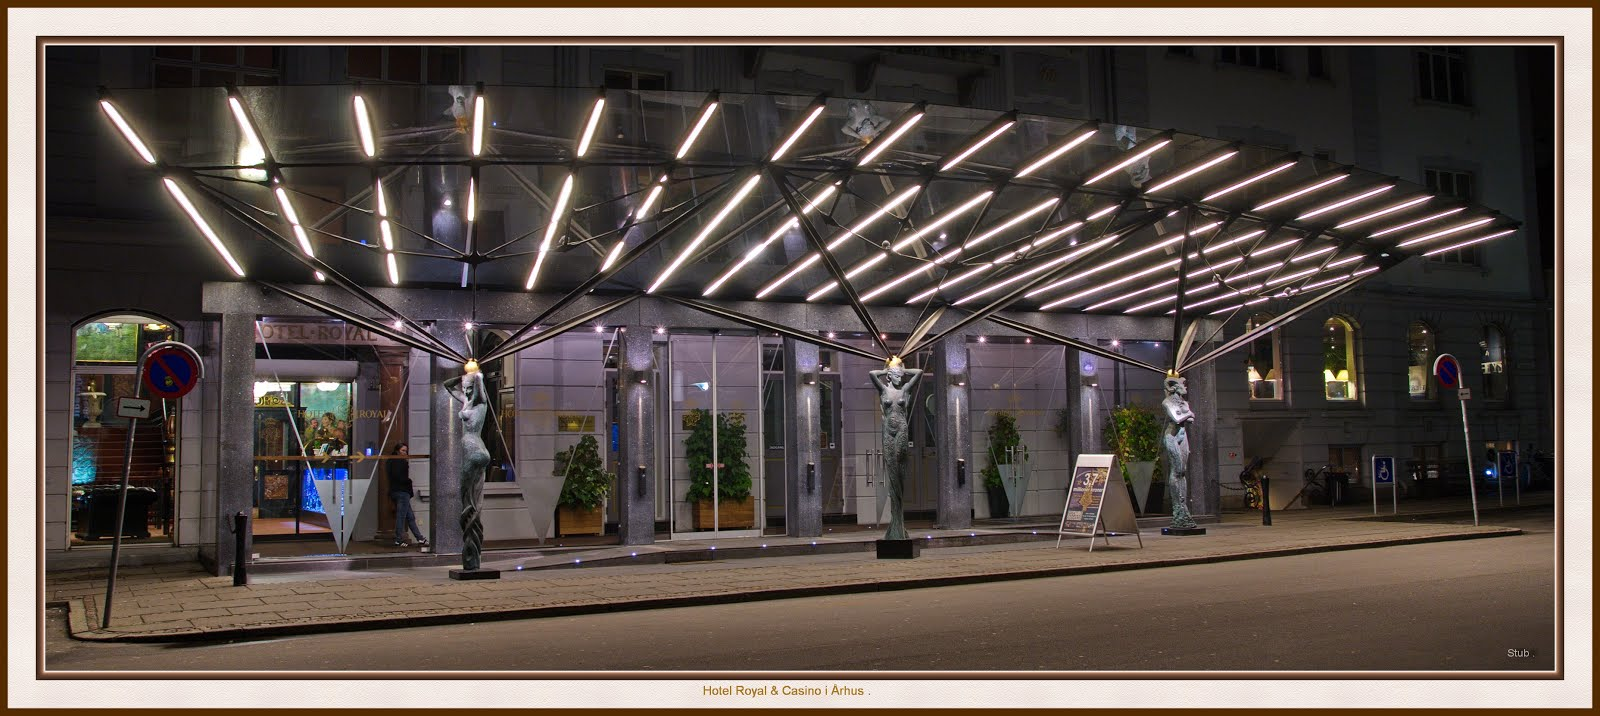 århus casino royal